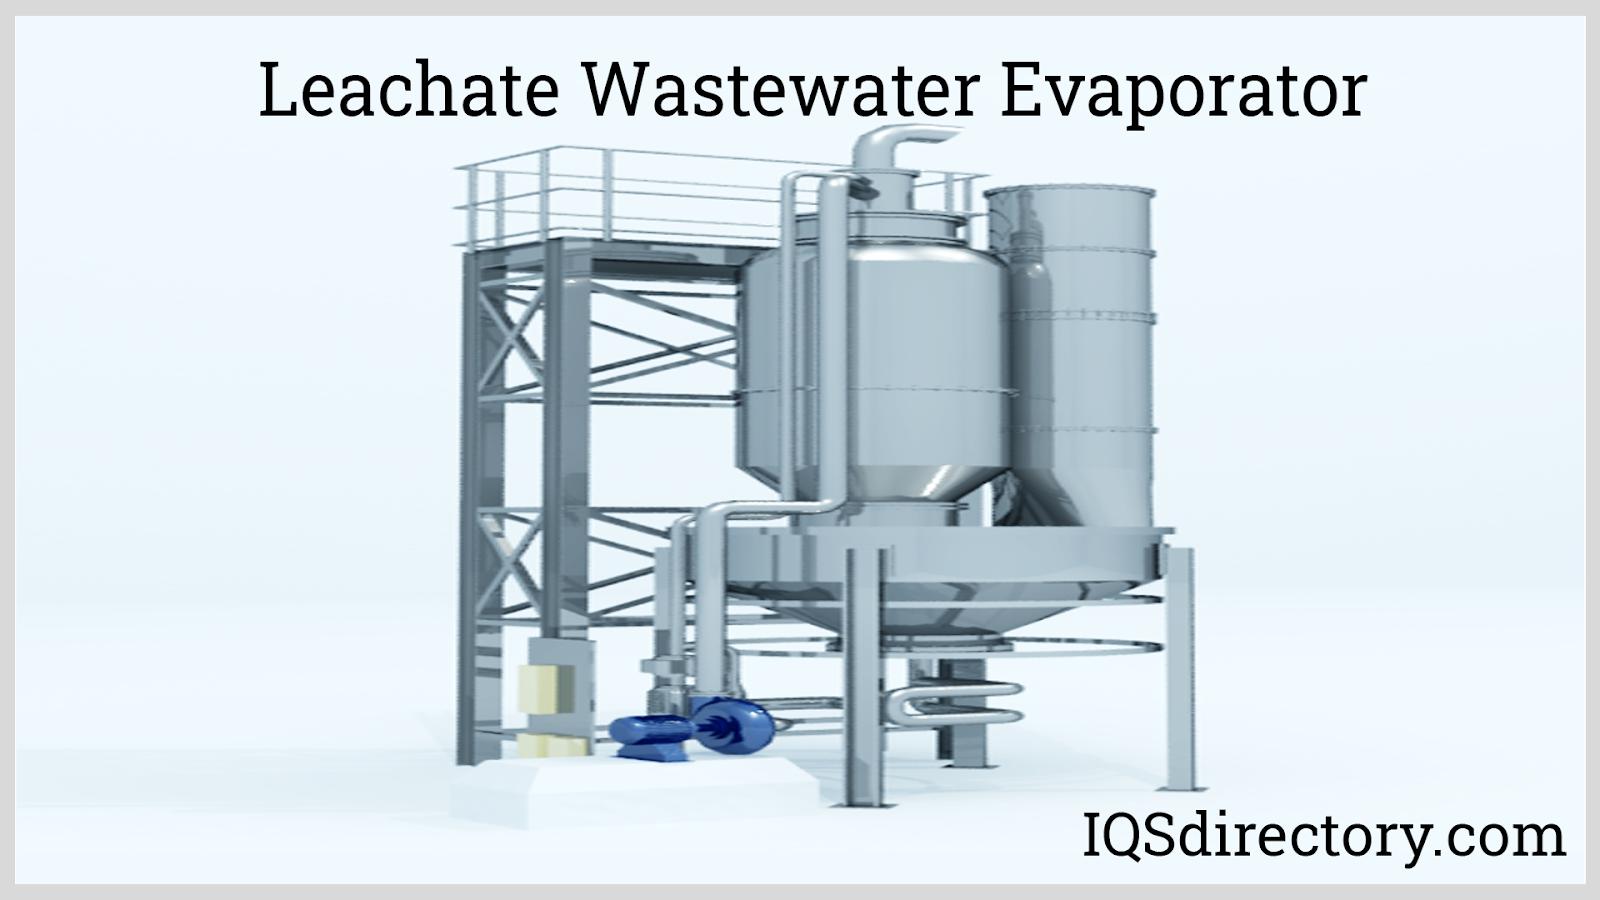 Leachate Wastewater Evaporator